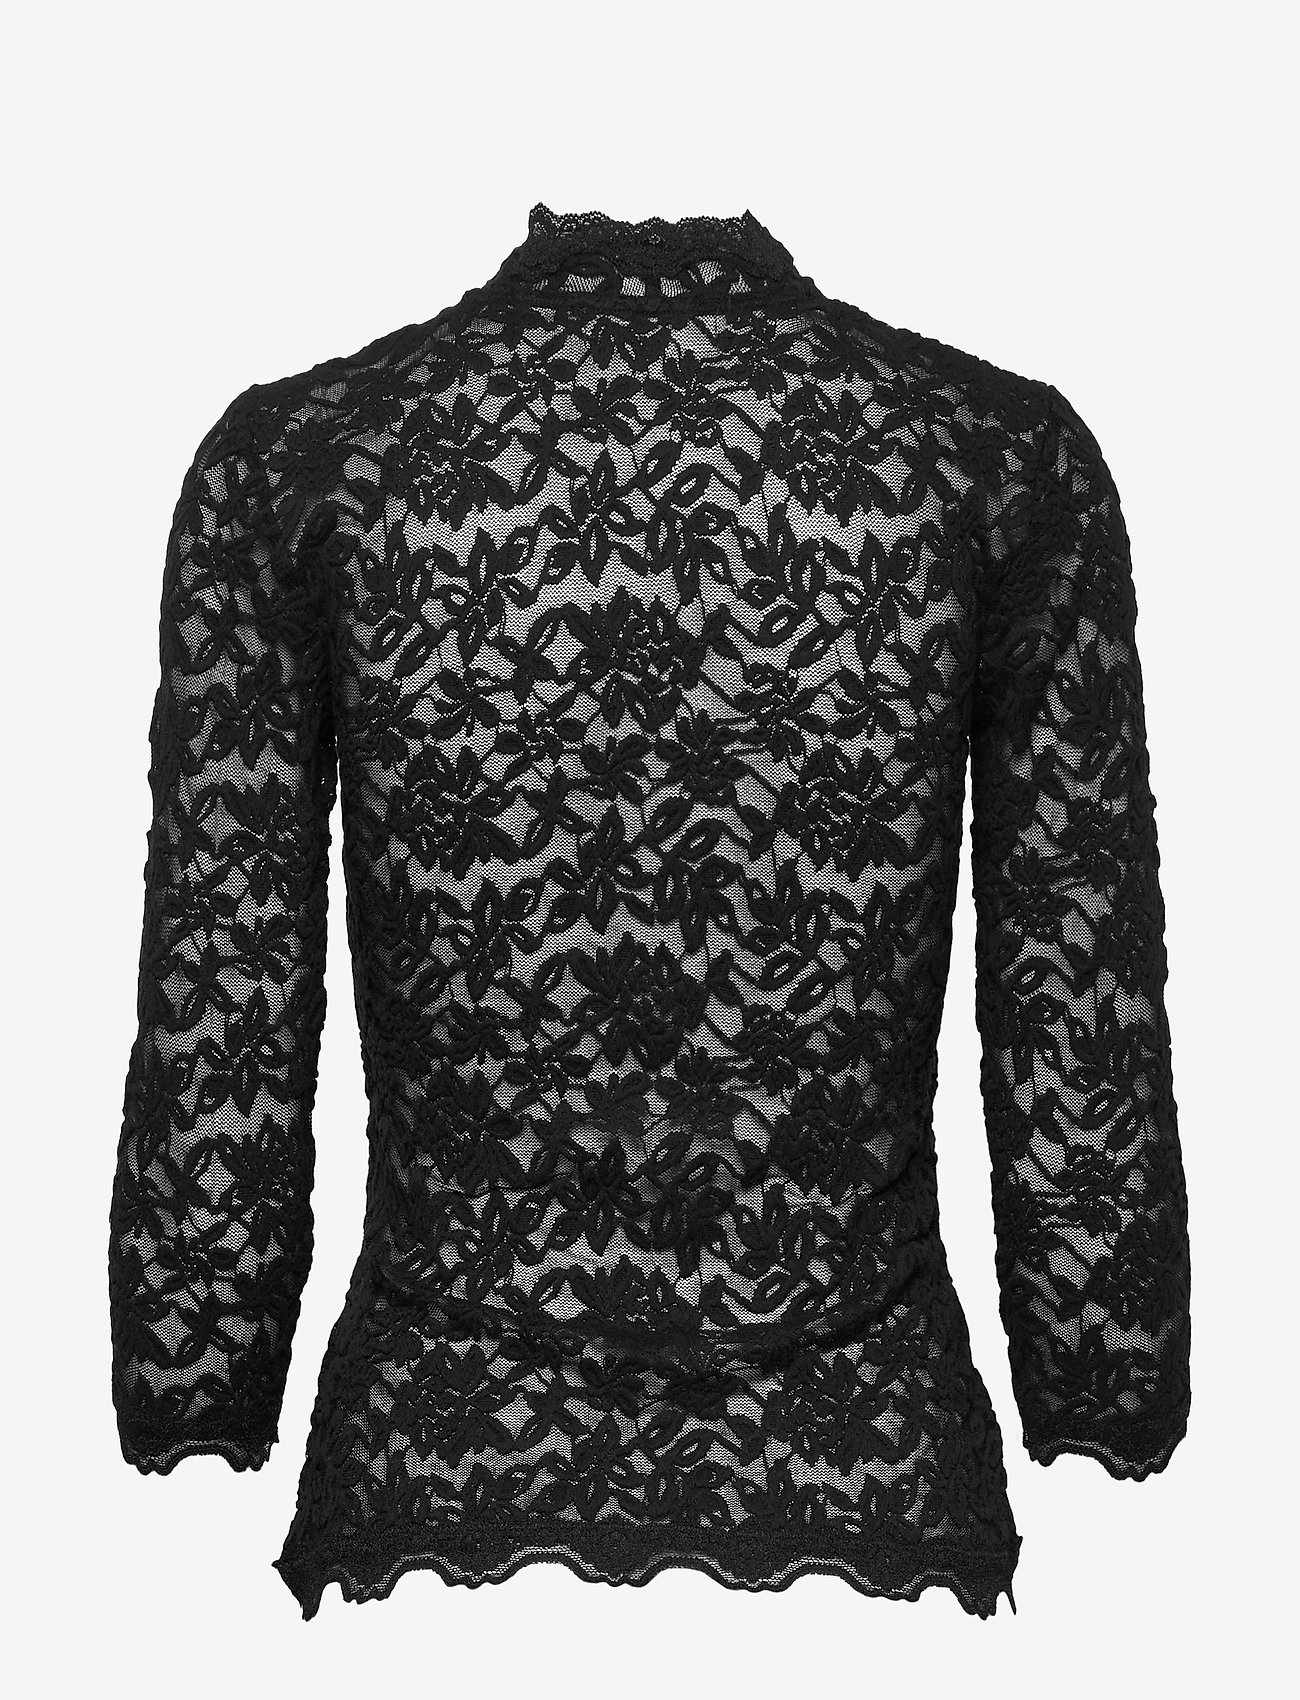 T-shirt 3/4 S (Black) - Rosemunde oAc4ZQ